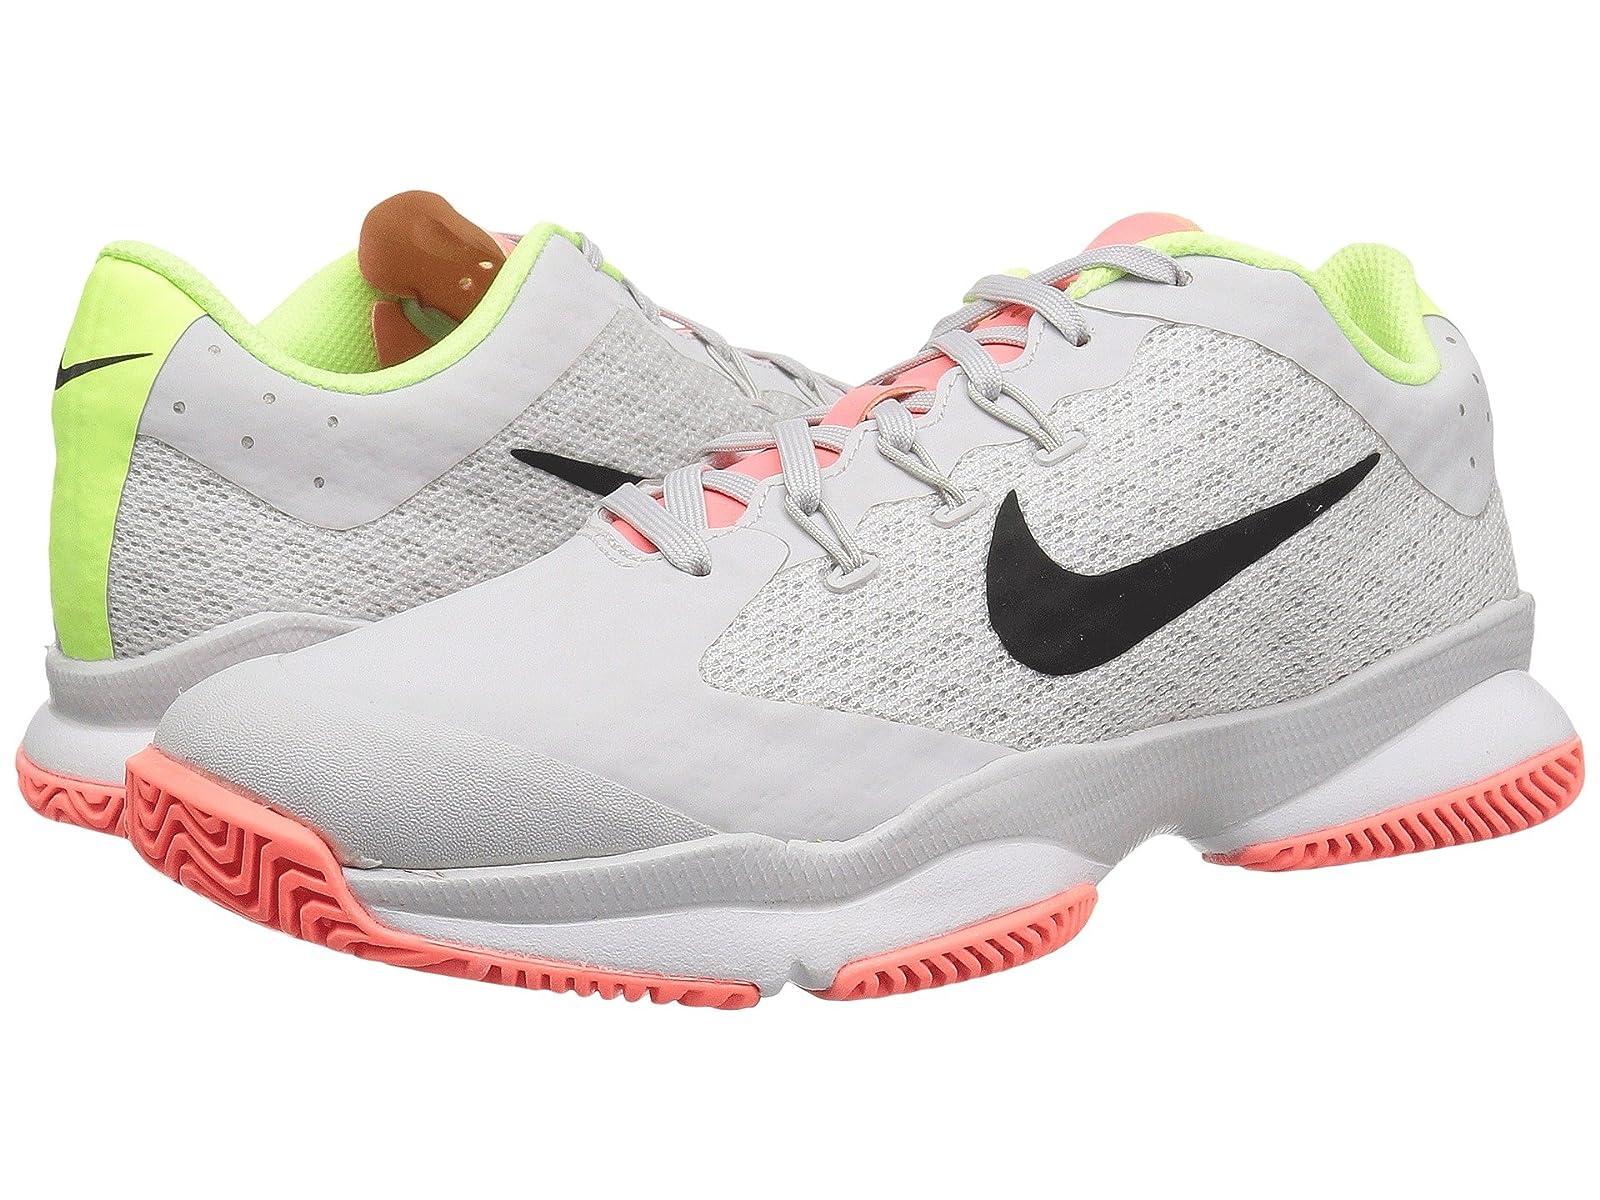 Nike Air Zoom UltraAtmospheric grades have affordable shoes